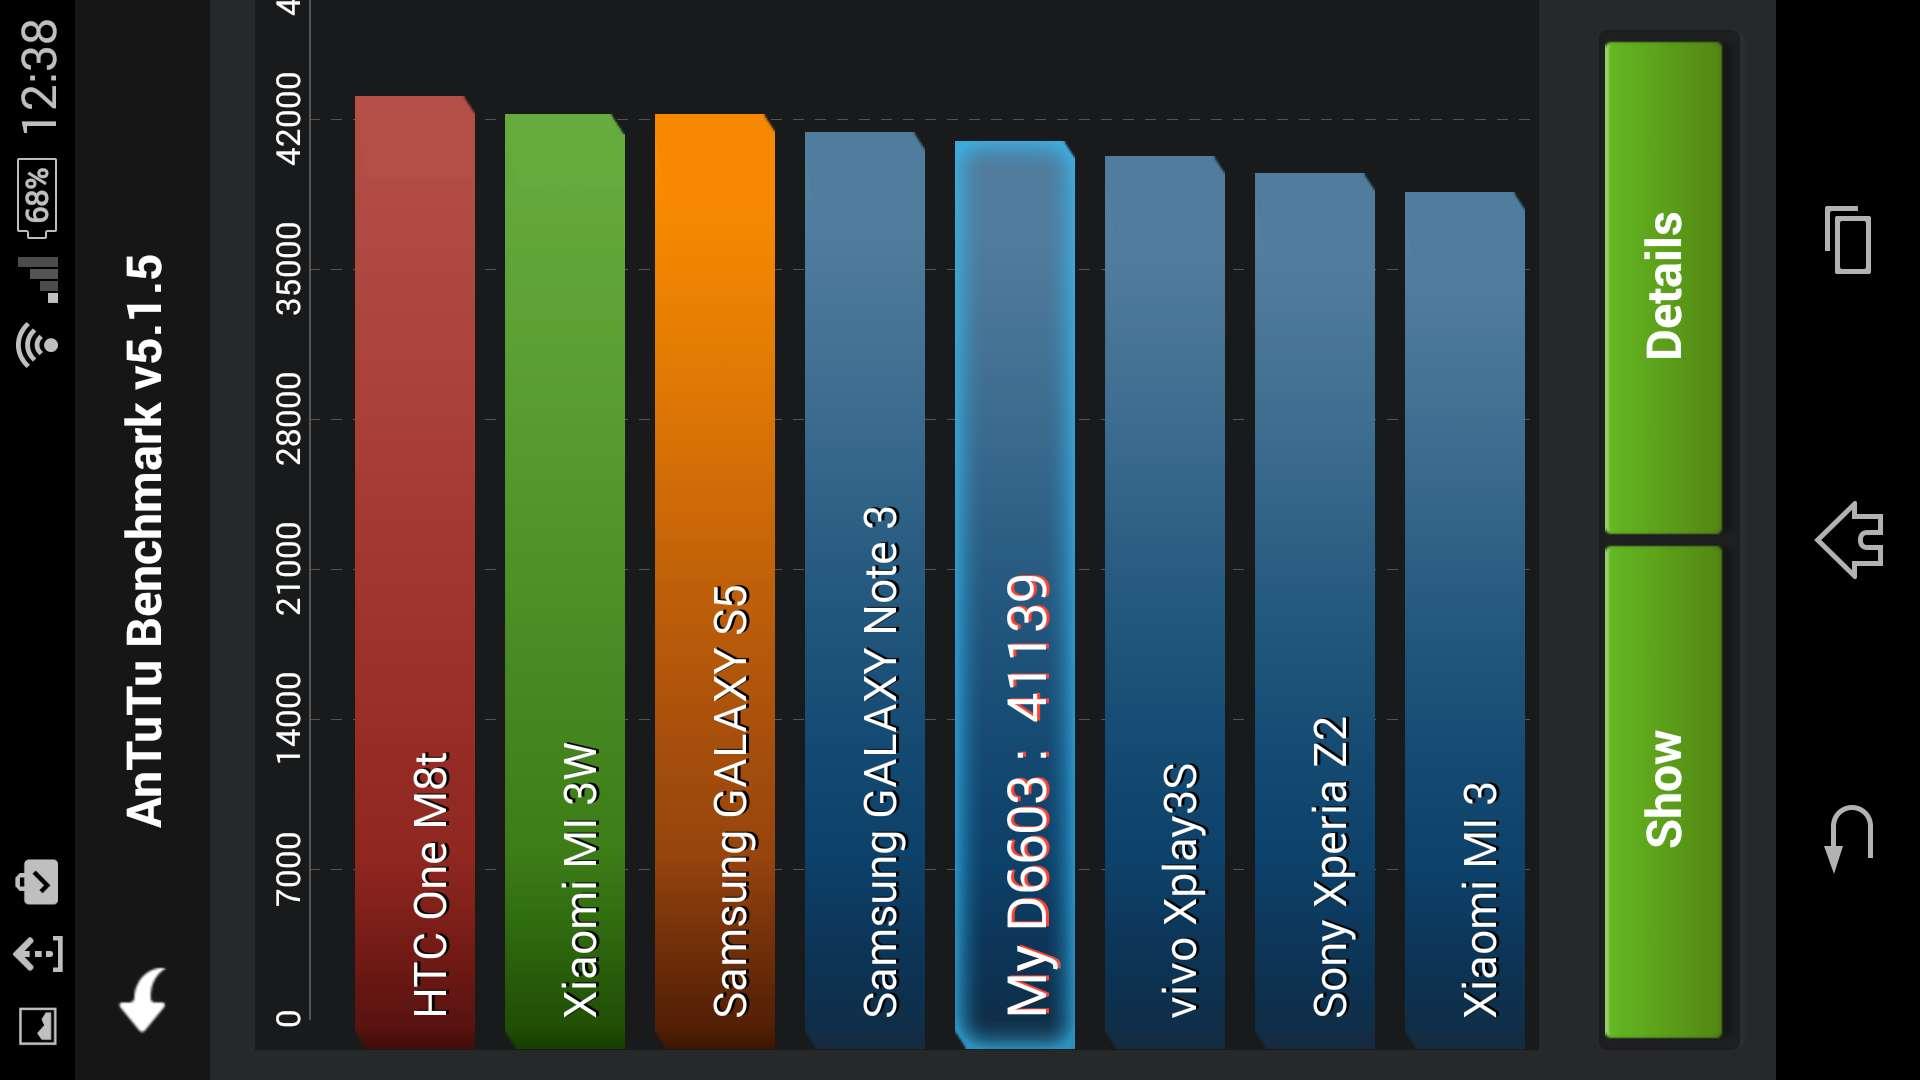 Sony Xperia Z3 - Antutu - 41139 puncte